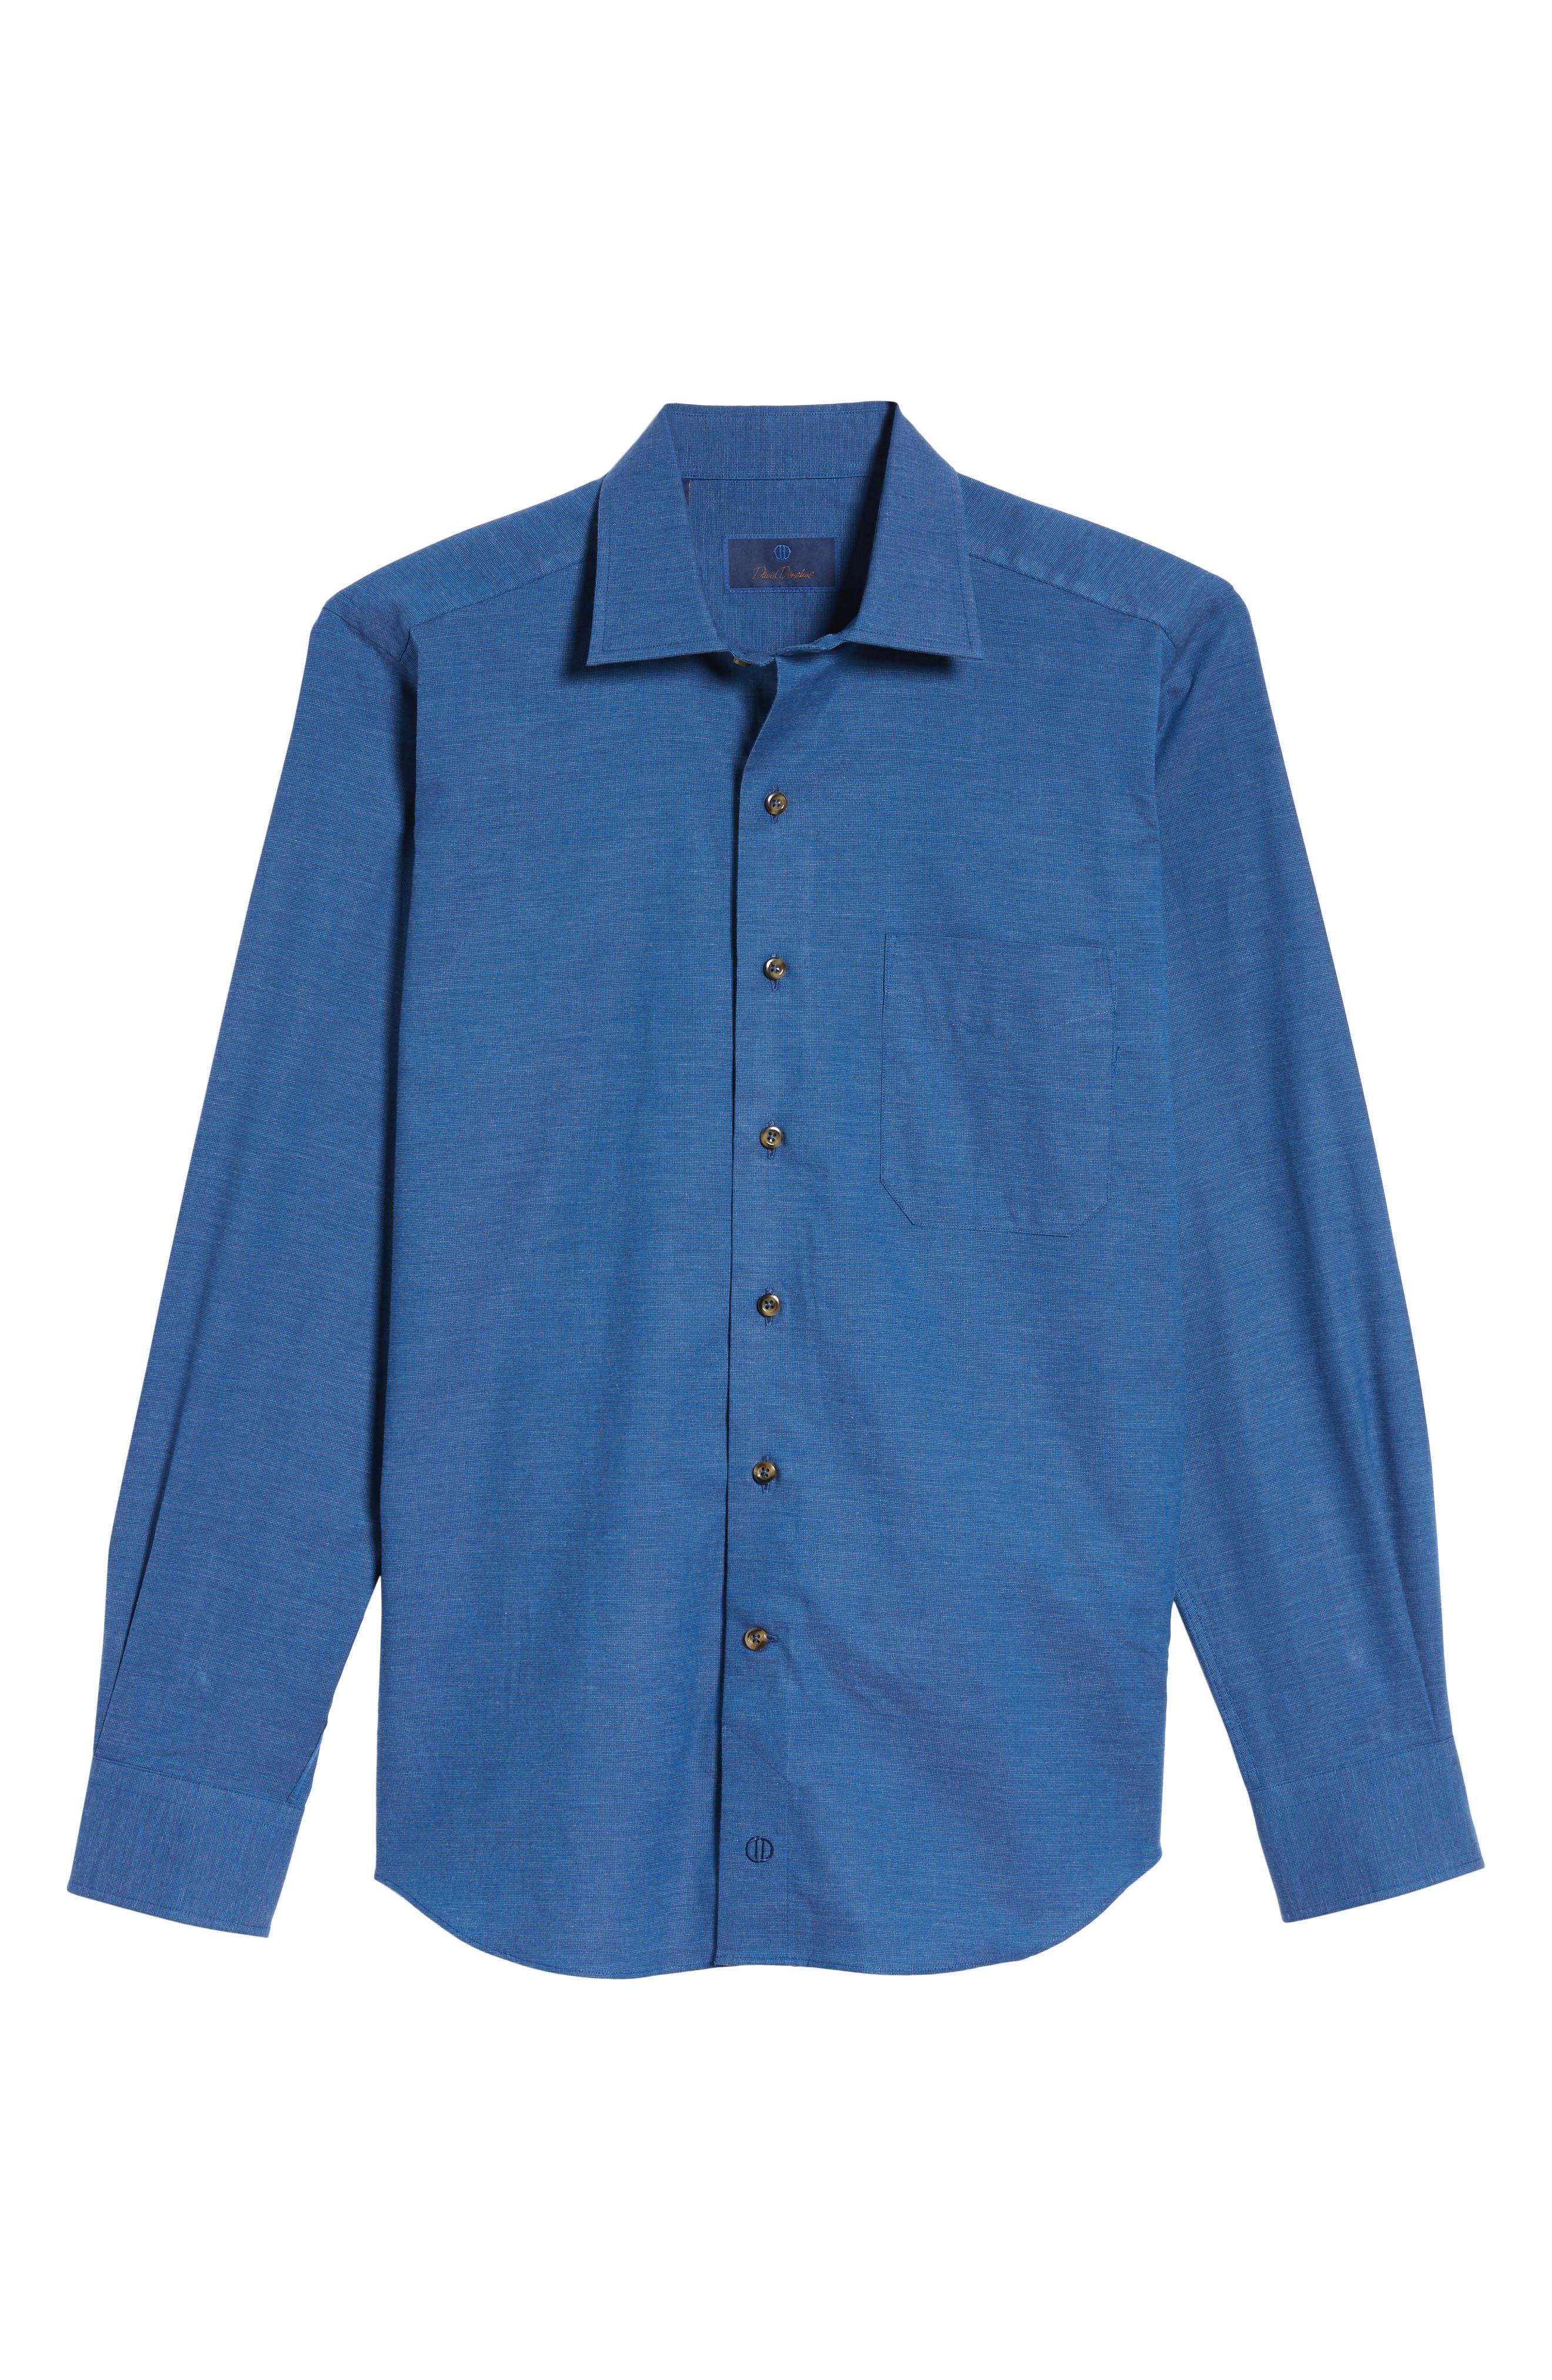 Regular Fit Woven Sport Shirt,                             Alternate thumbnail 6, color,                             Navy